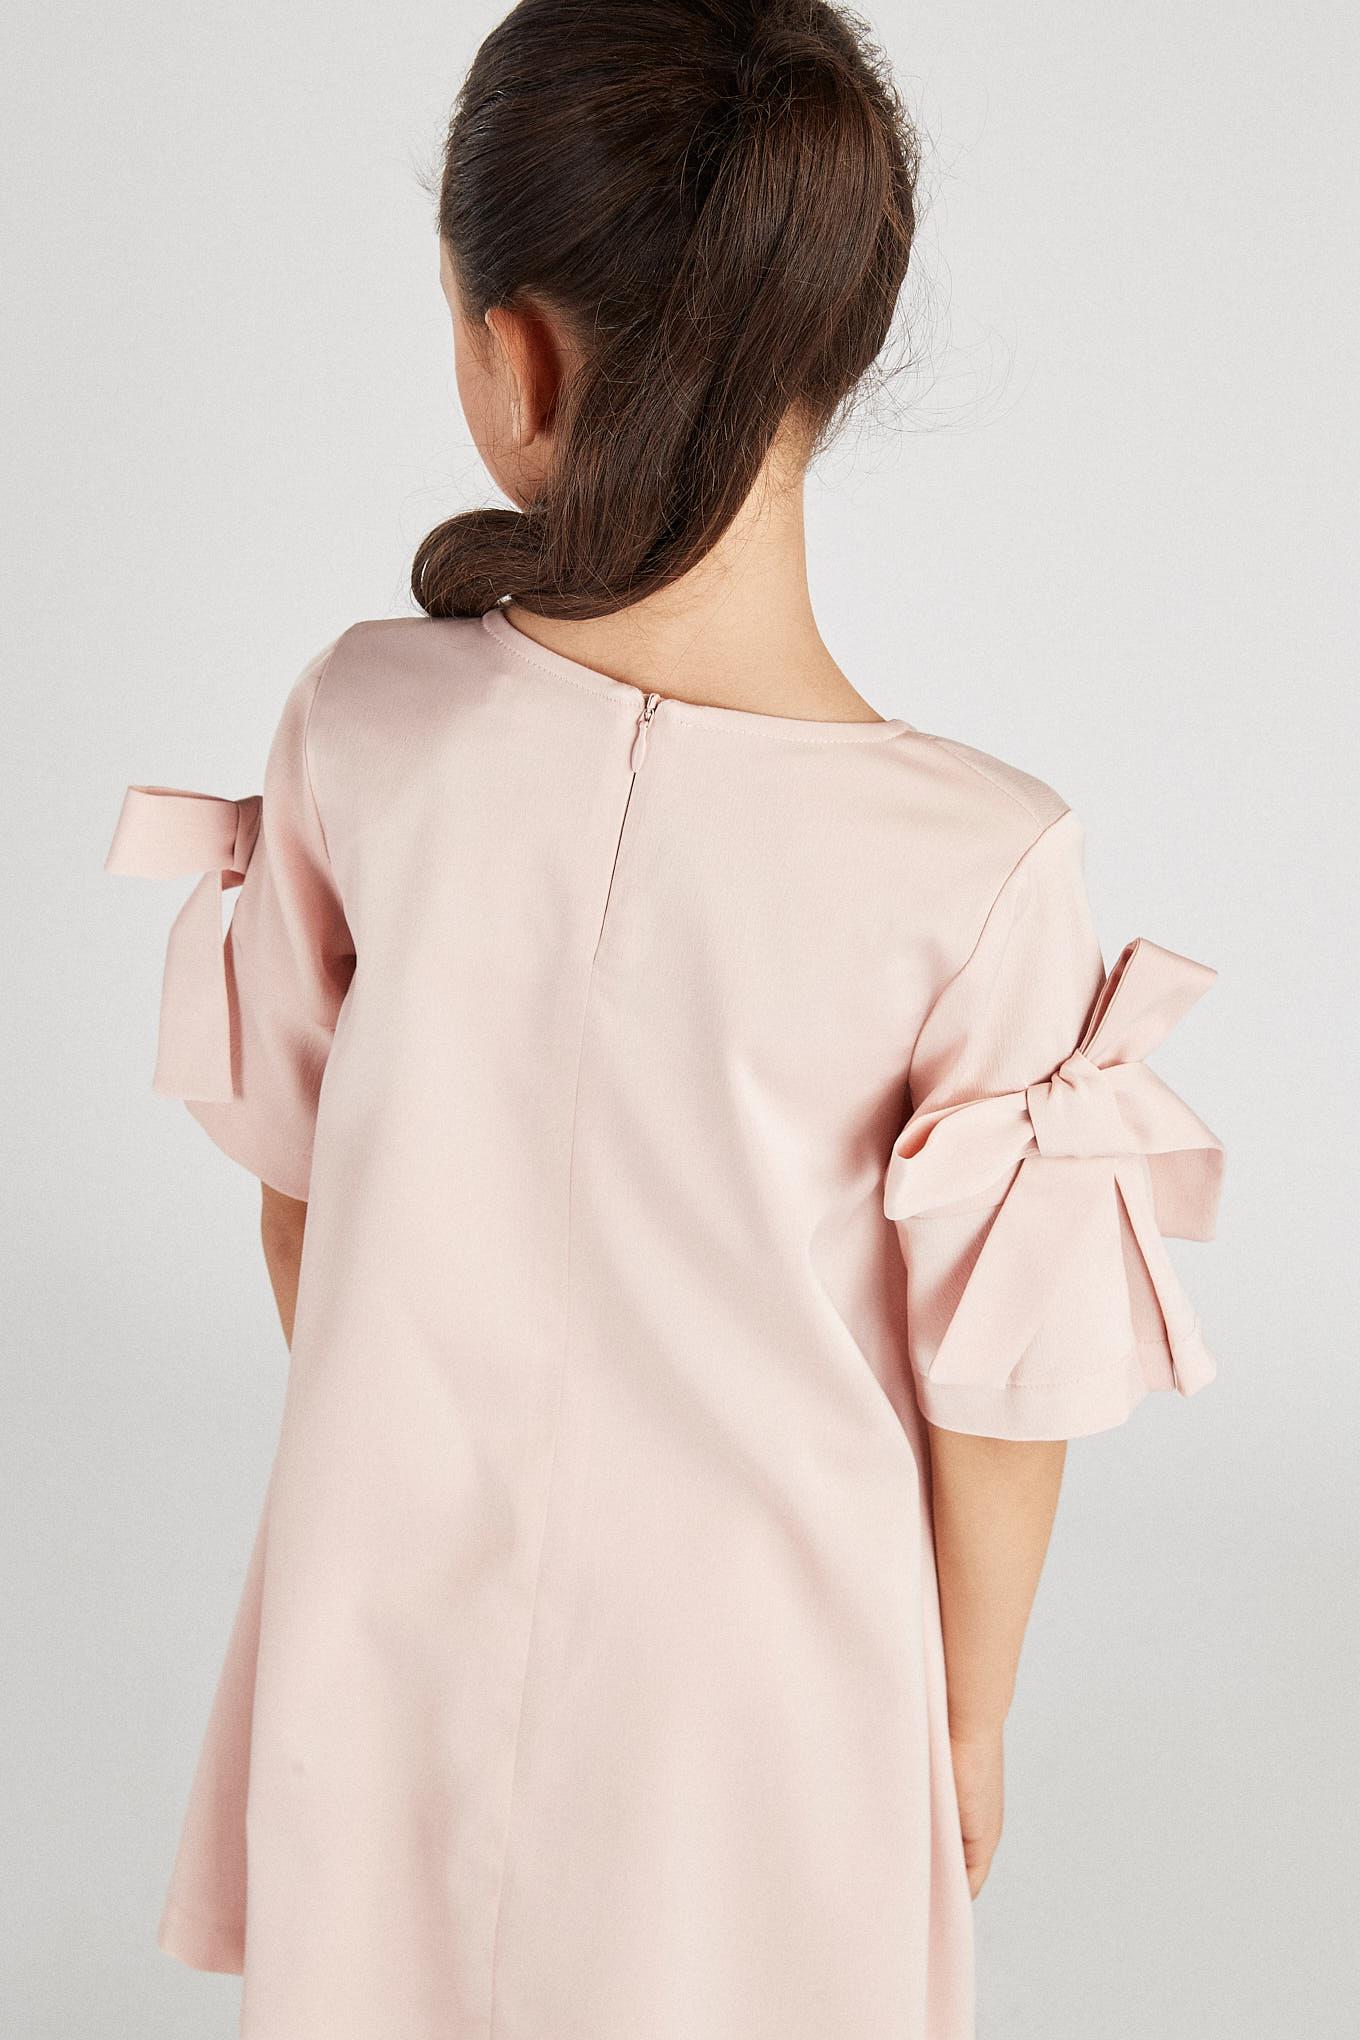 Dress Pink Fantasy Girl